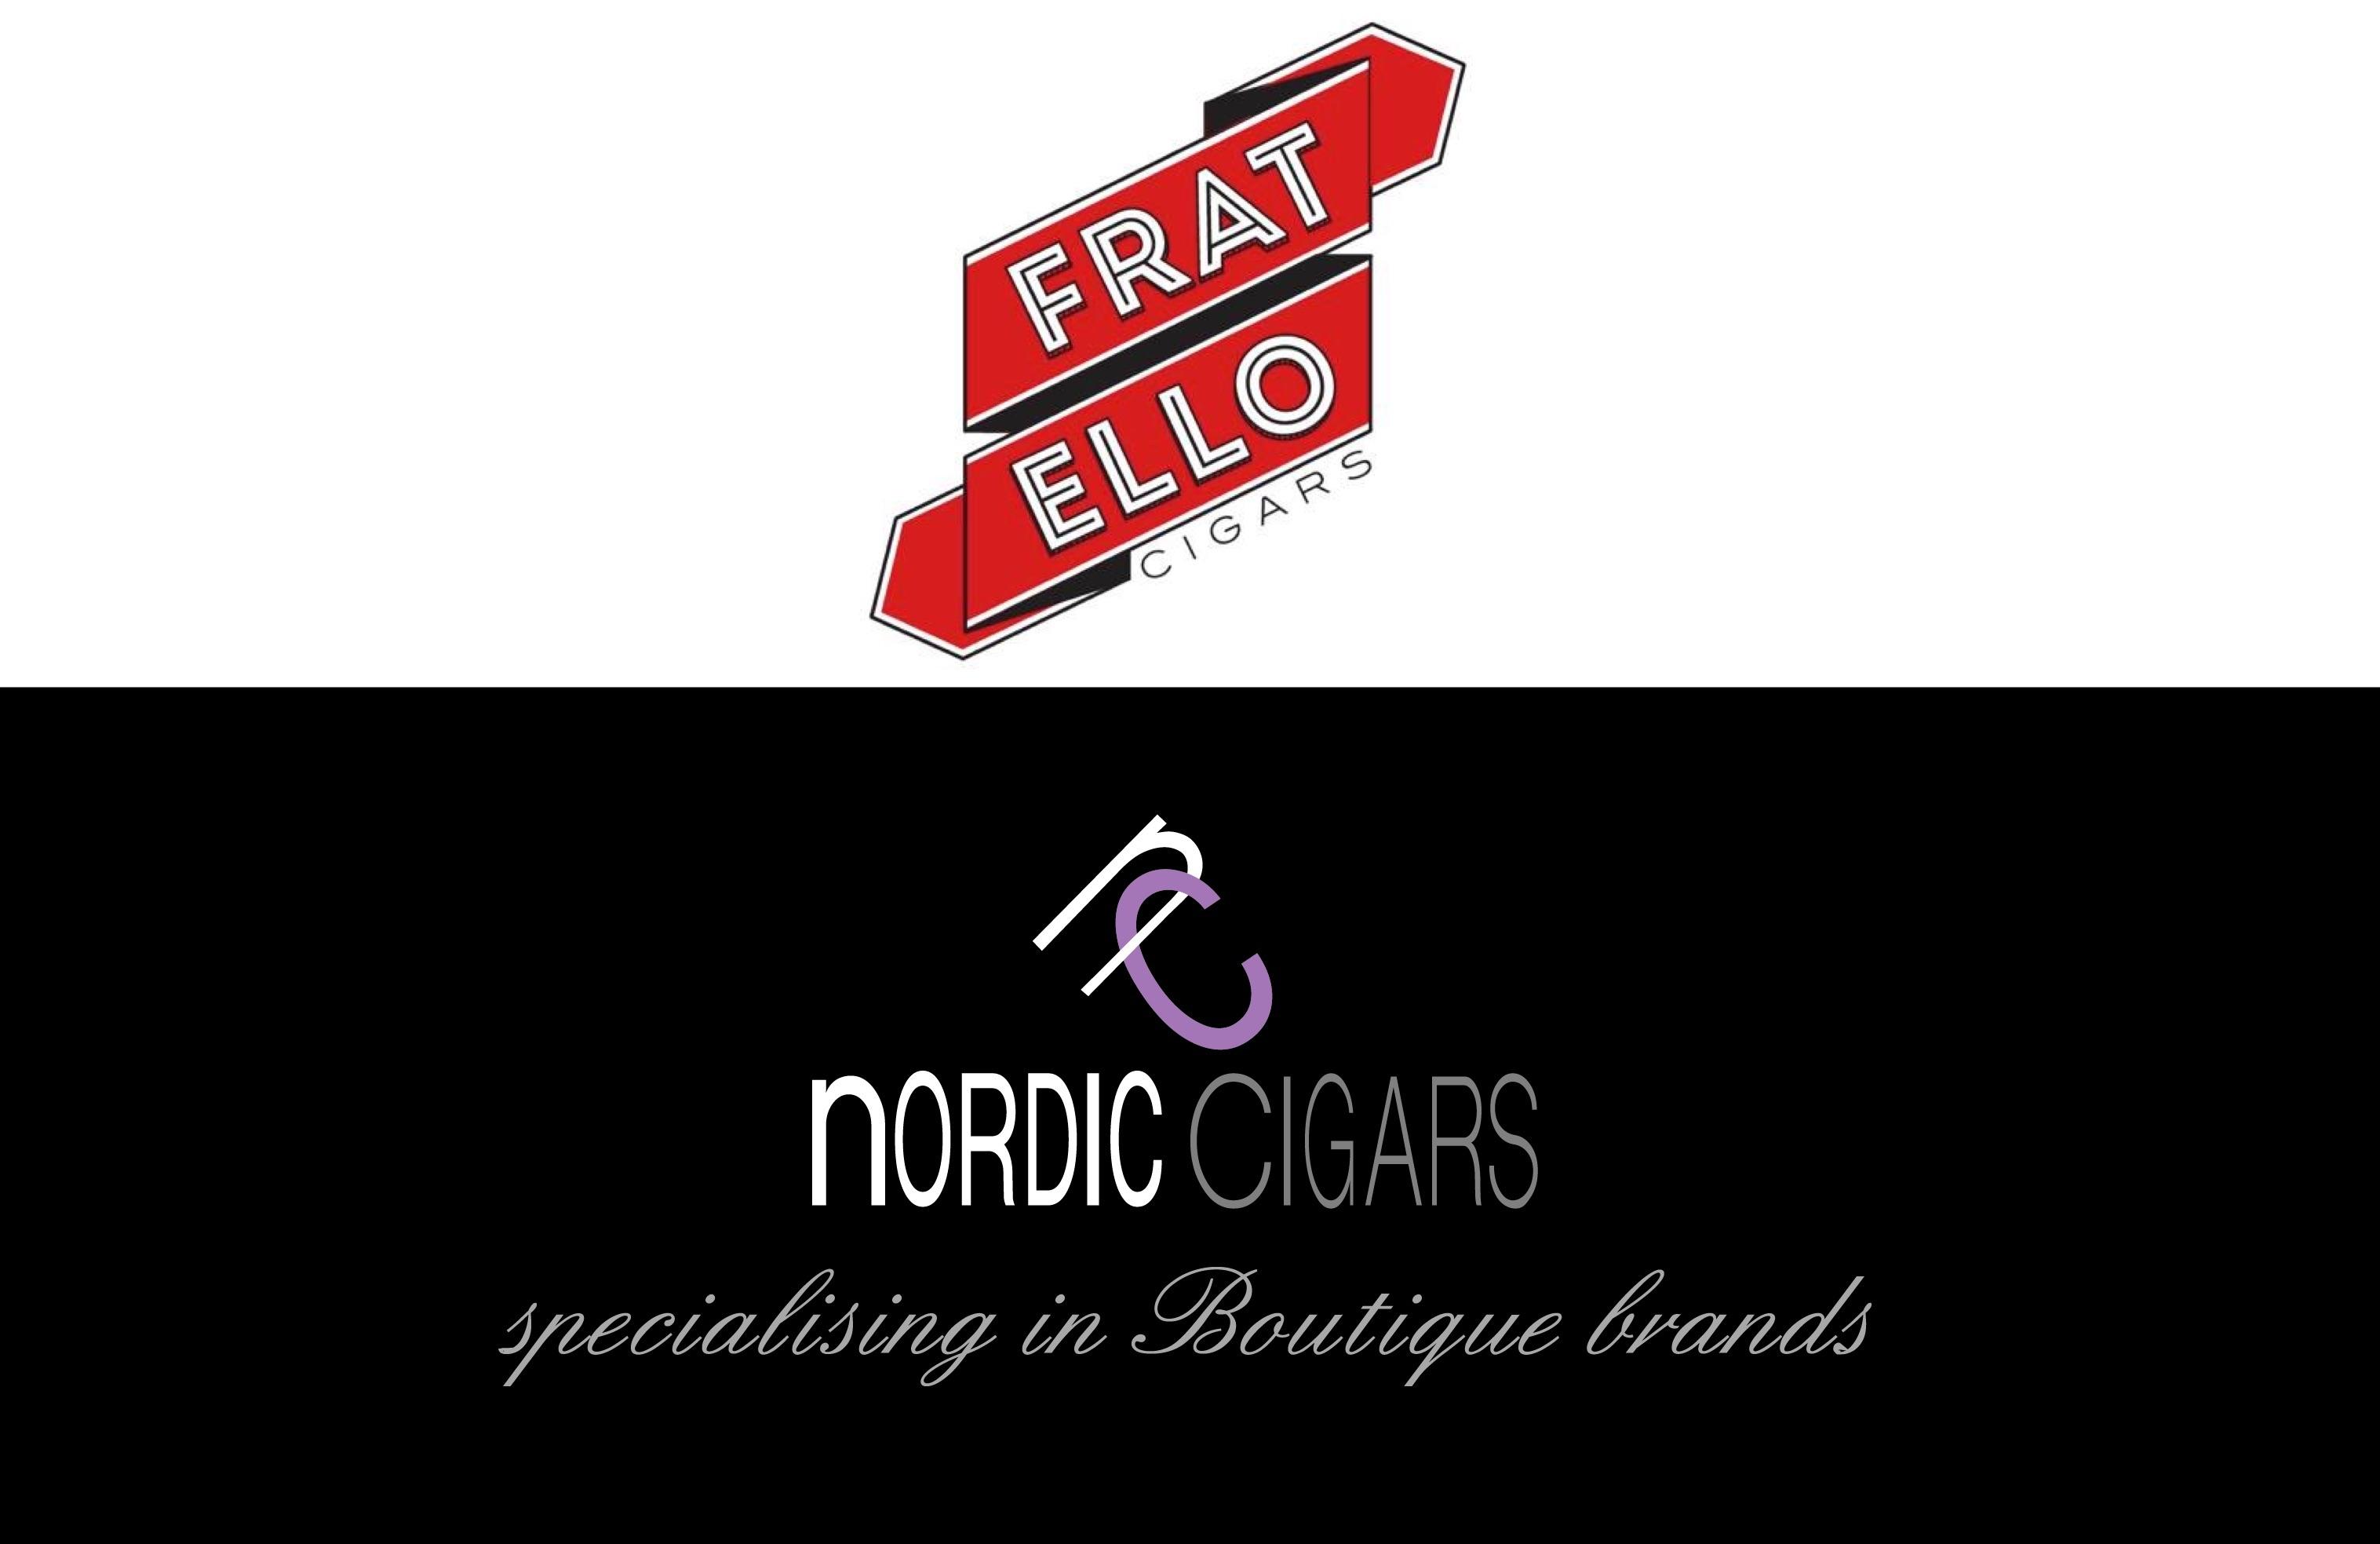 Cigar News: Fratello Cigars Announces Norwegian Distribution Partner